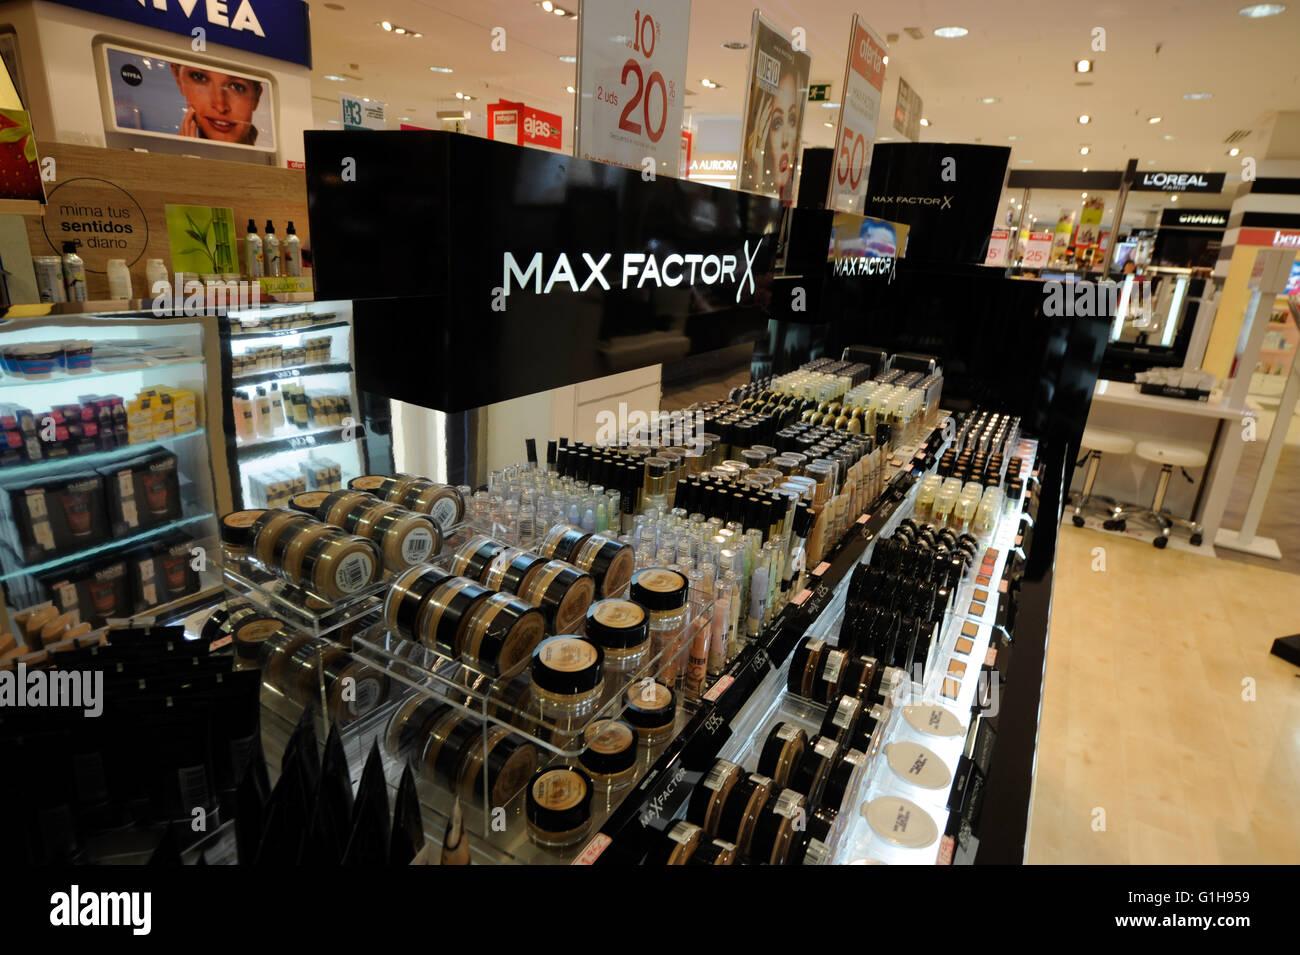 Max Factor X,department store, el Corte Ingles, Malaga - Stock Image